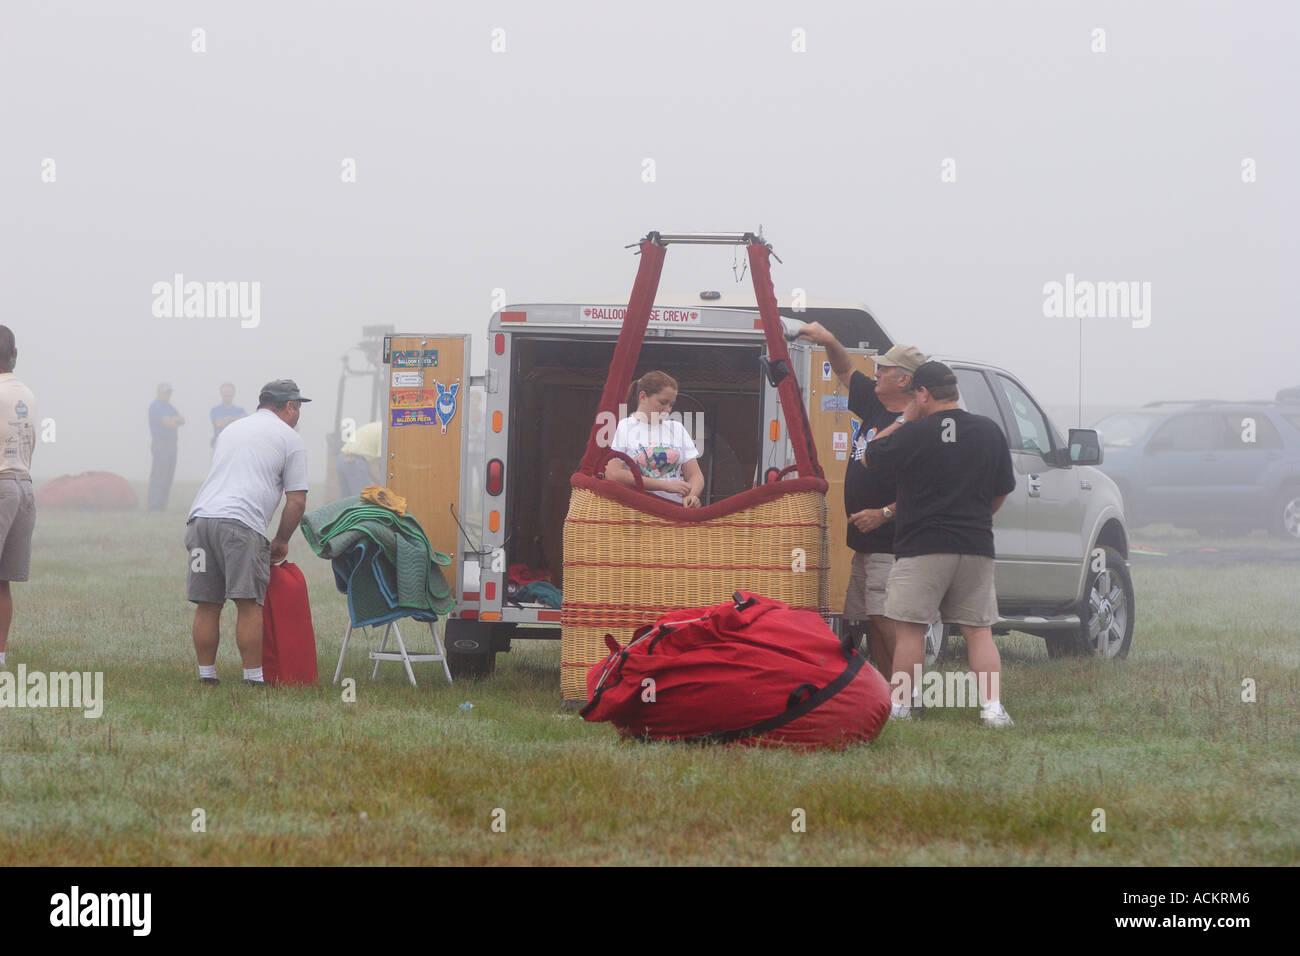 Hot air balloons prepare for lift off at balloon festival in Dunnellon, Florida, USA Stock Photo